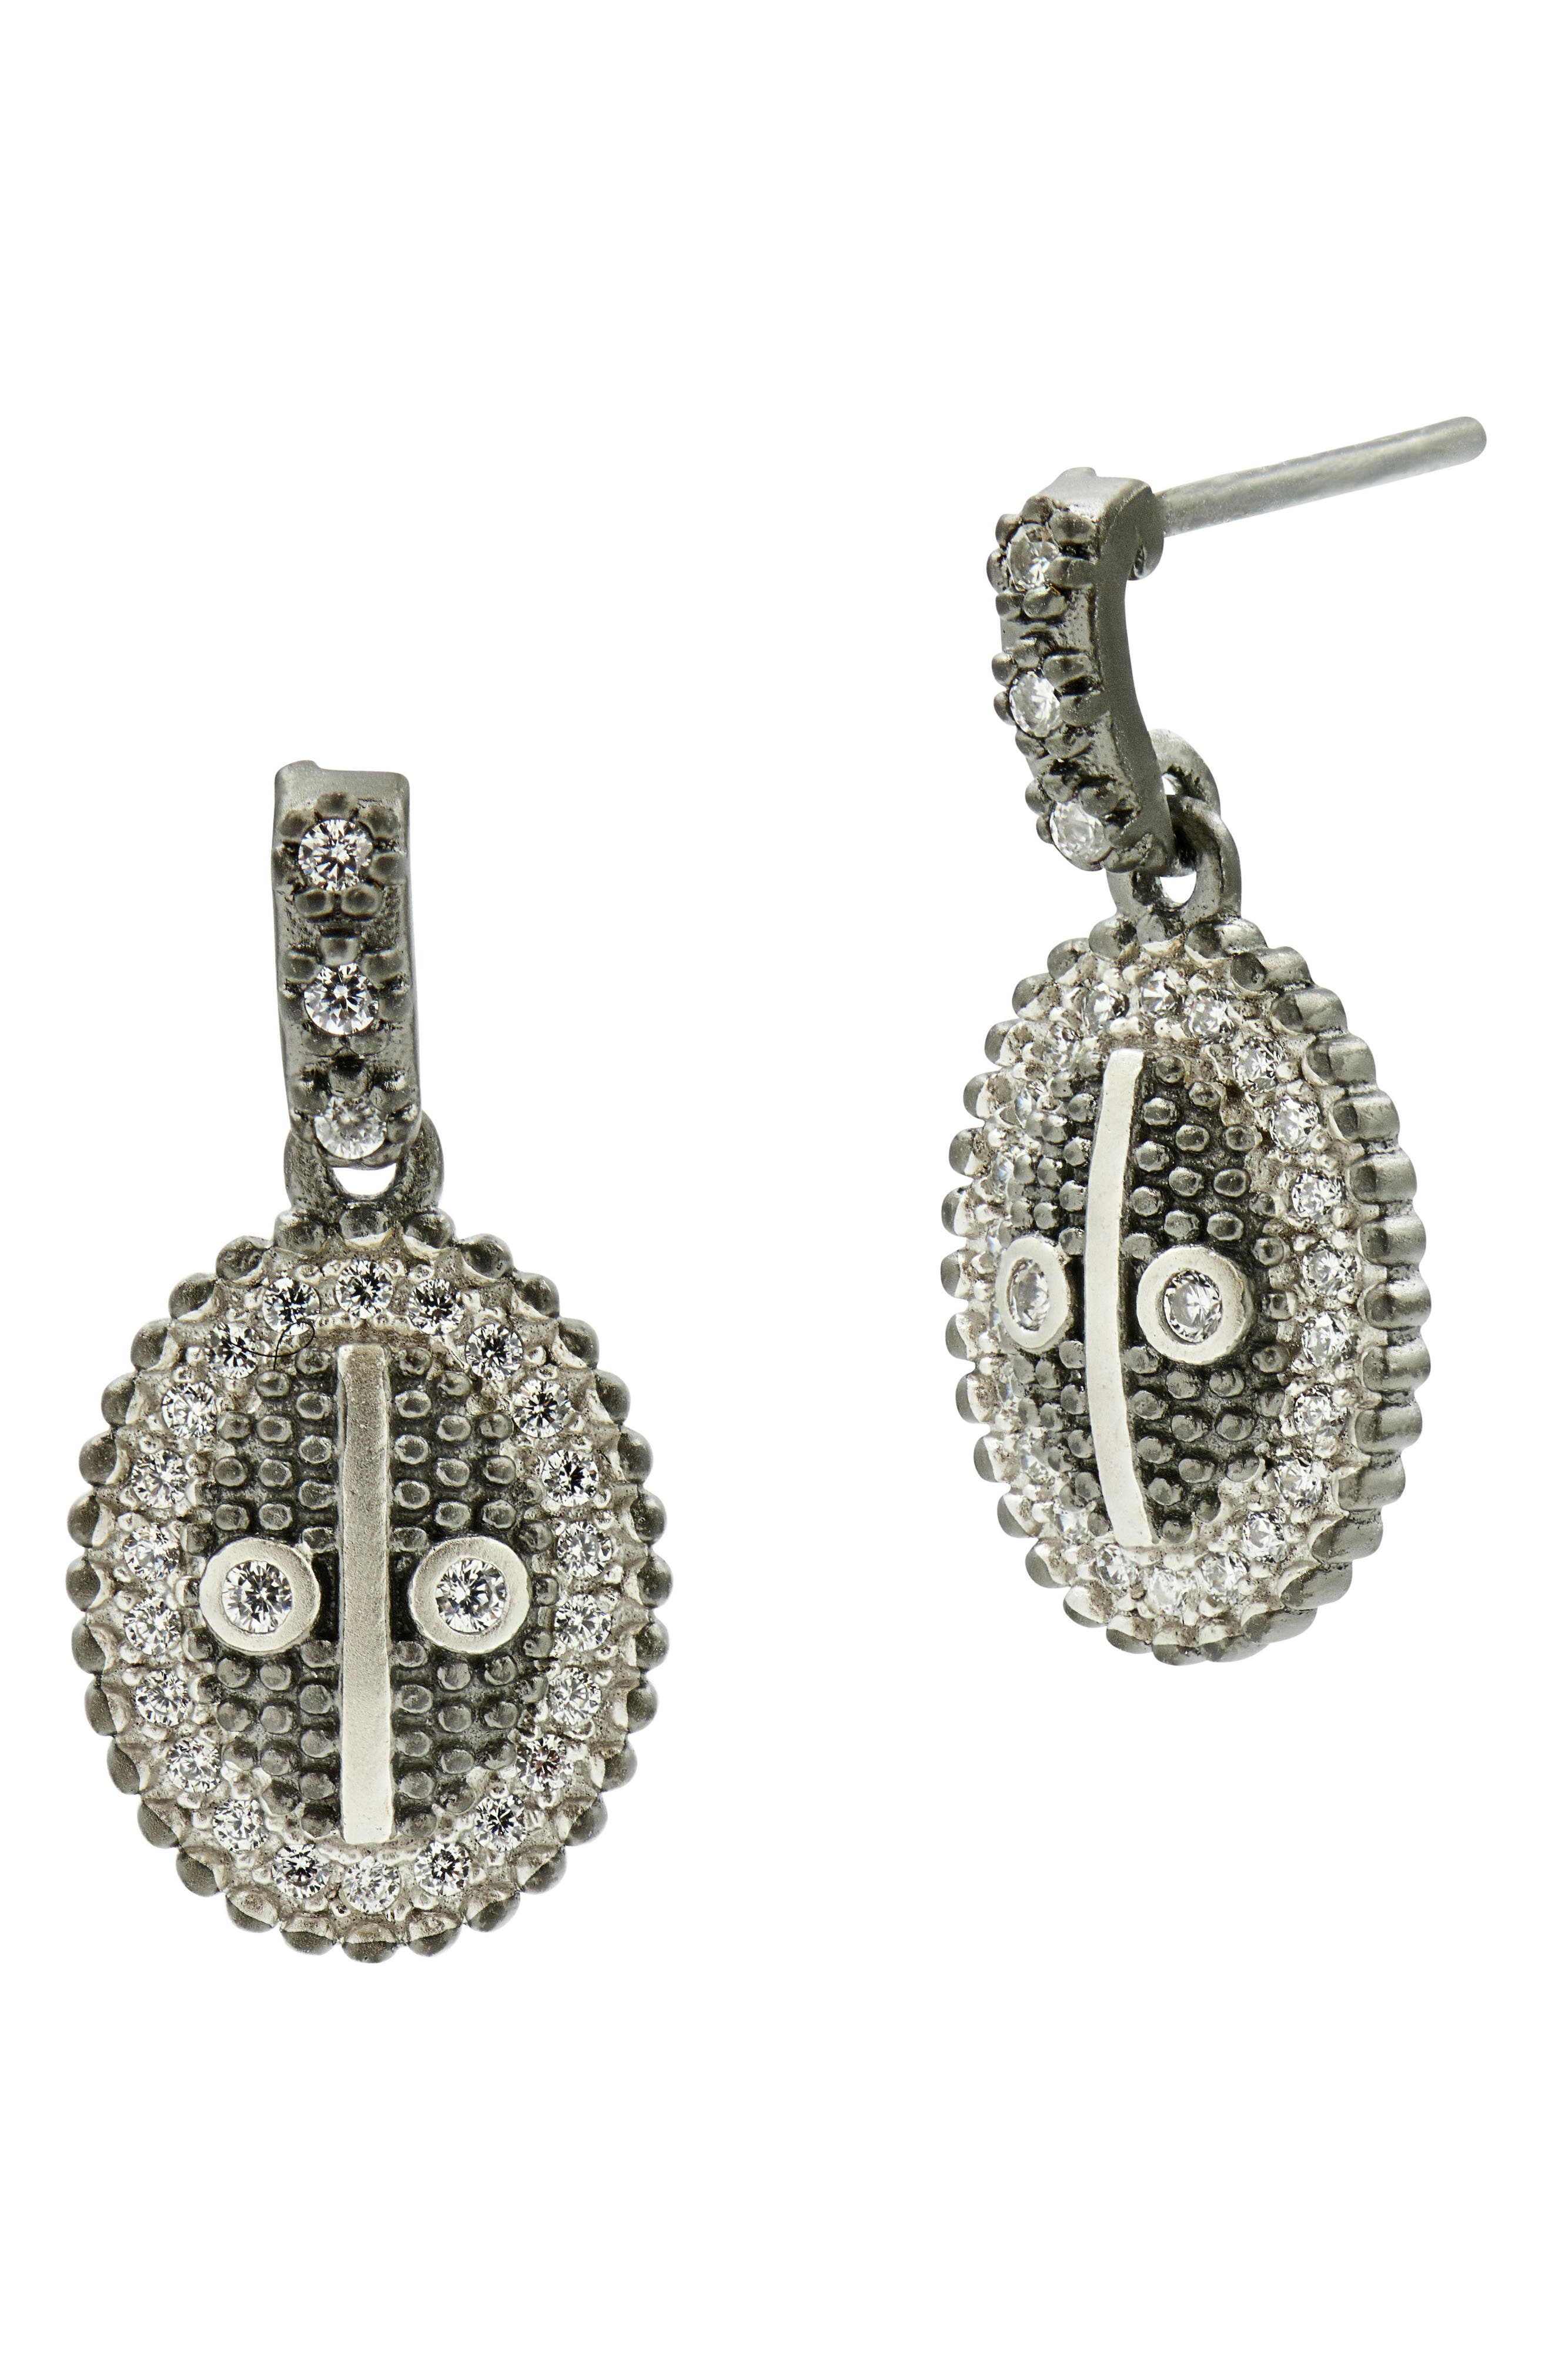 FREIDA ROTHMAN Industrial Finish Oval Drop Earrings